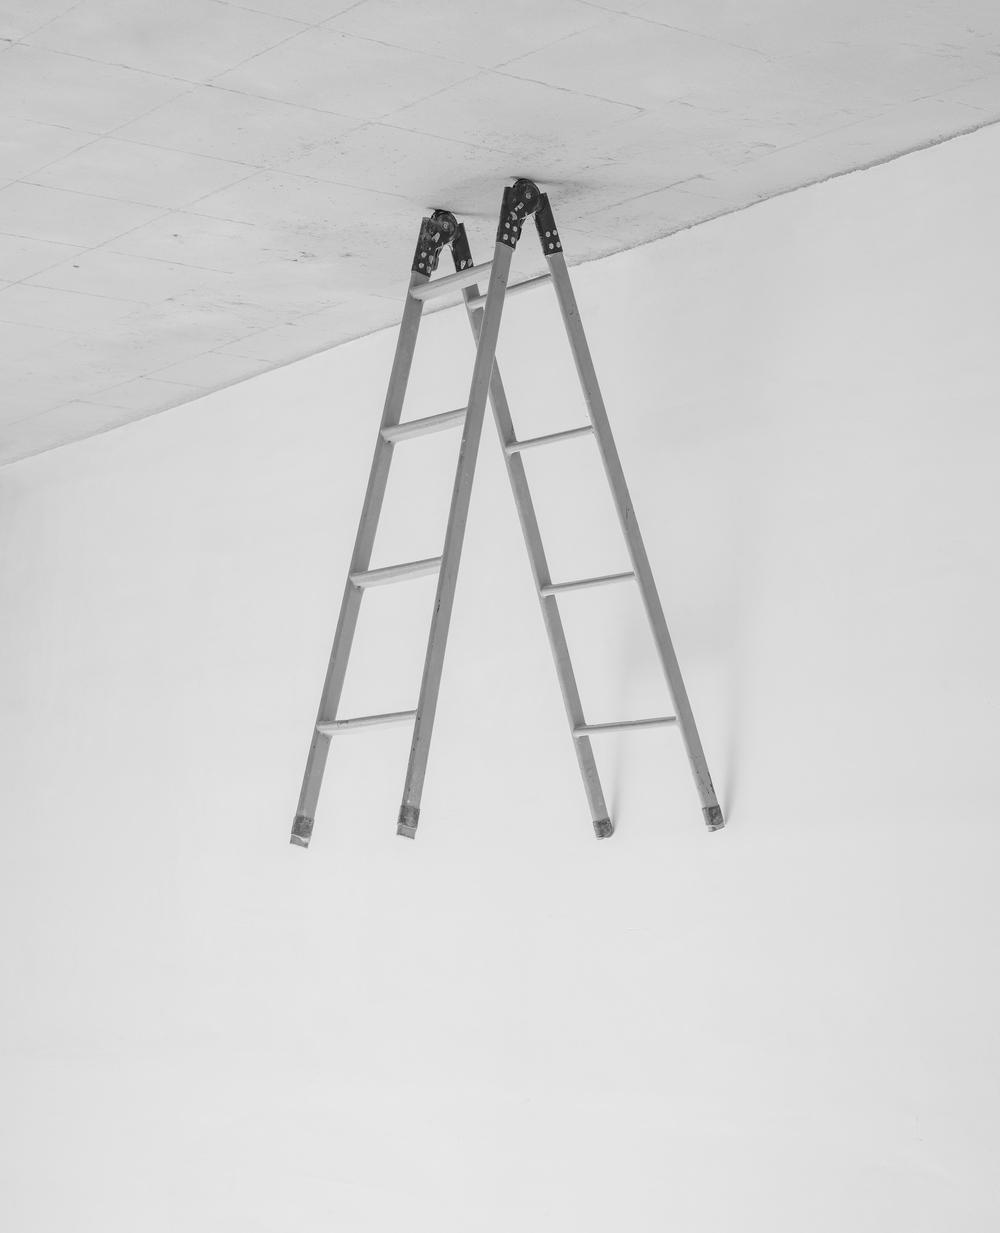 Ji Zhou 计洲, Spectacle No.6 景之六, 2013, Ultra Giclee 艺术微喷, 185 x 150 cm